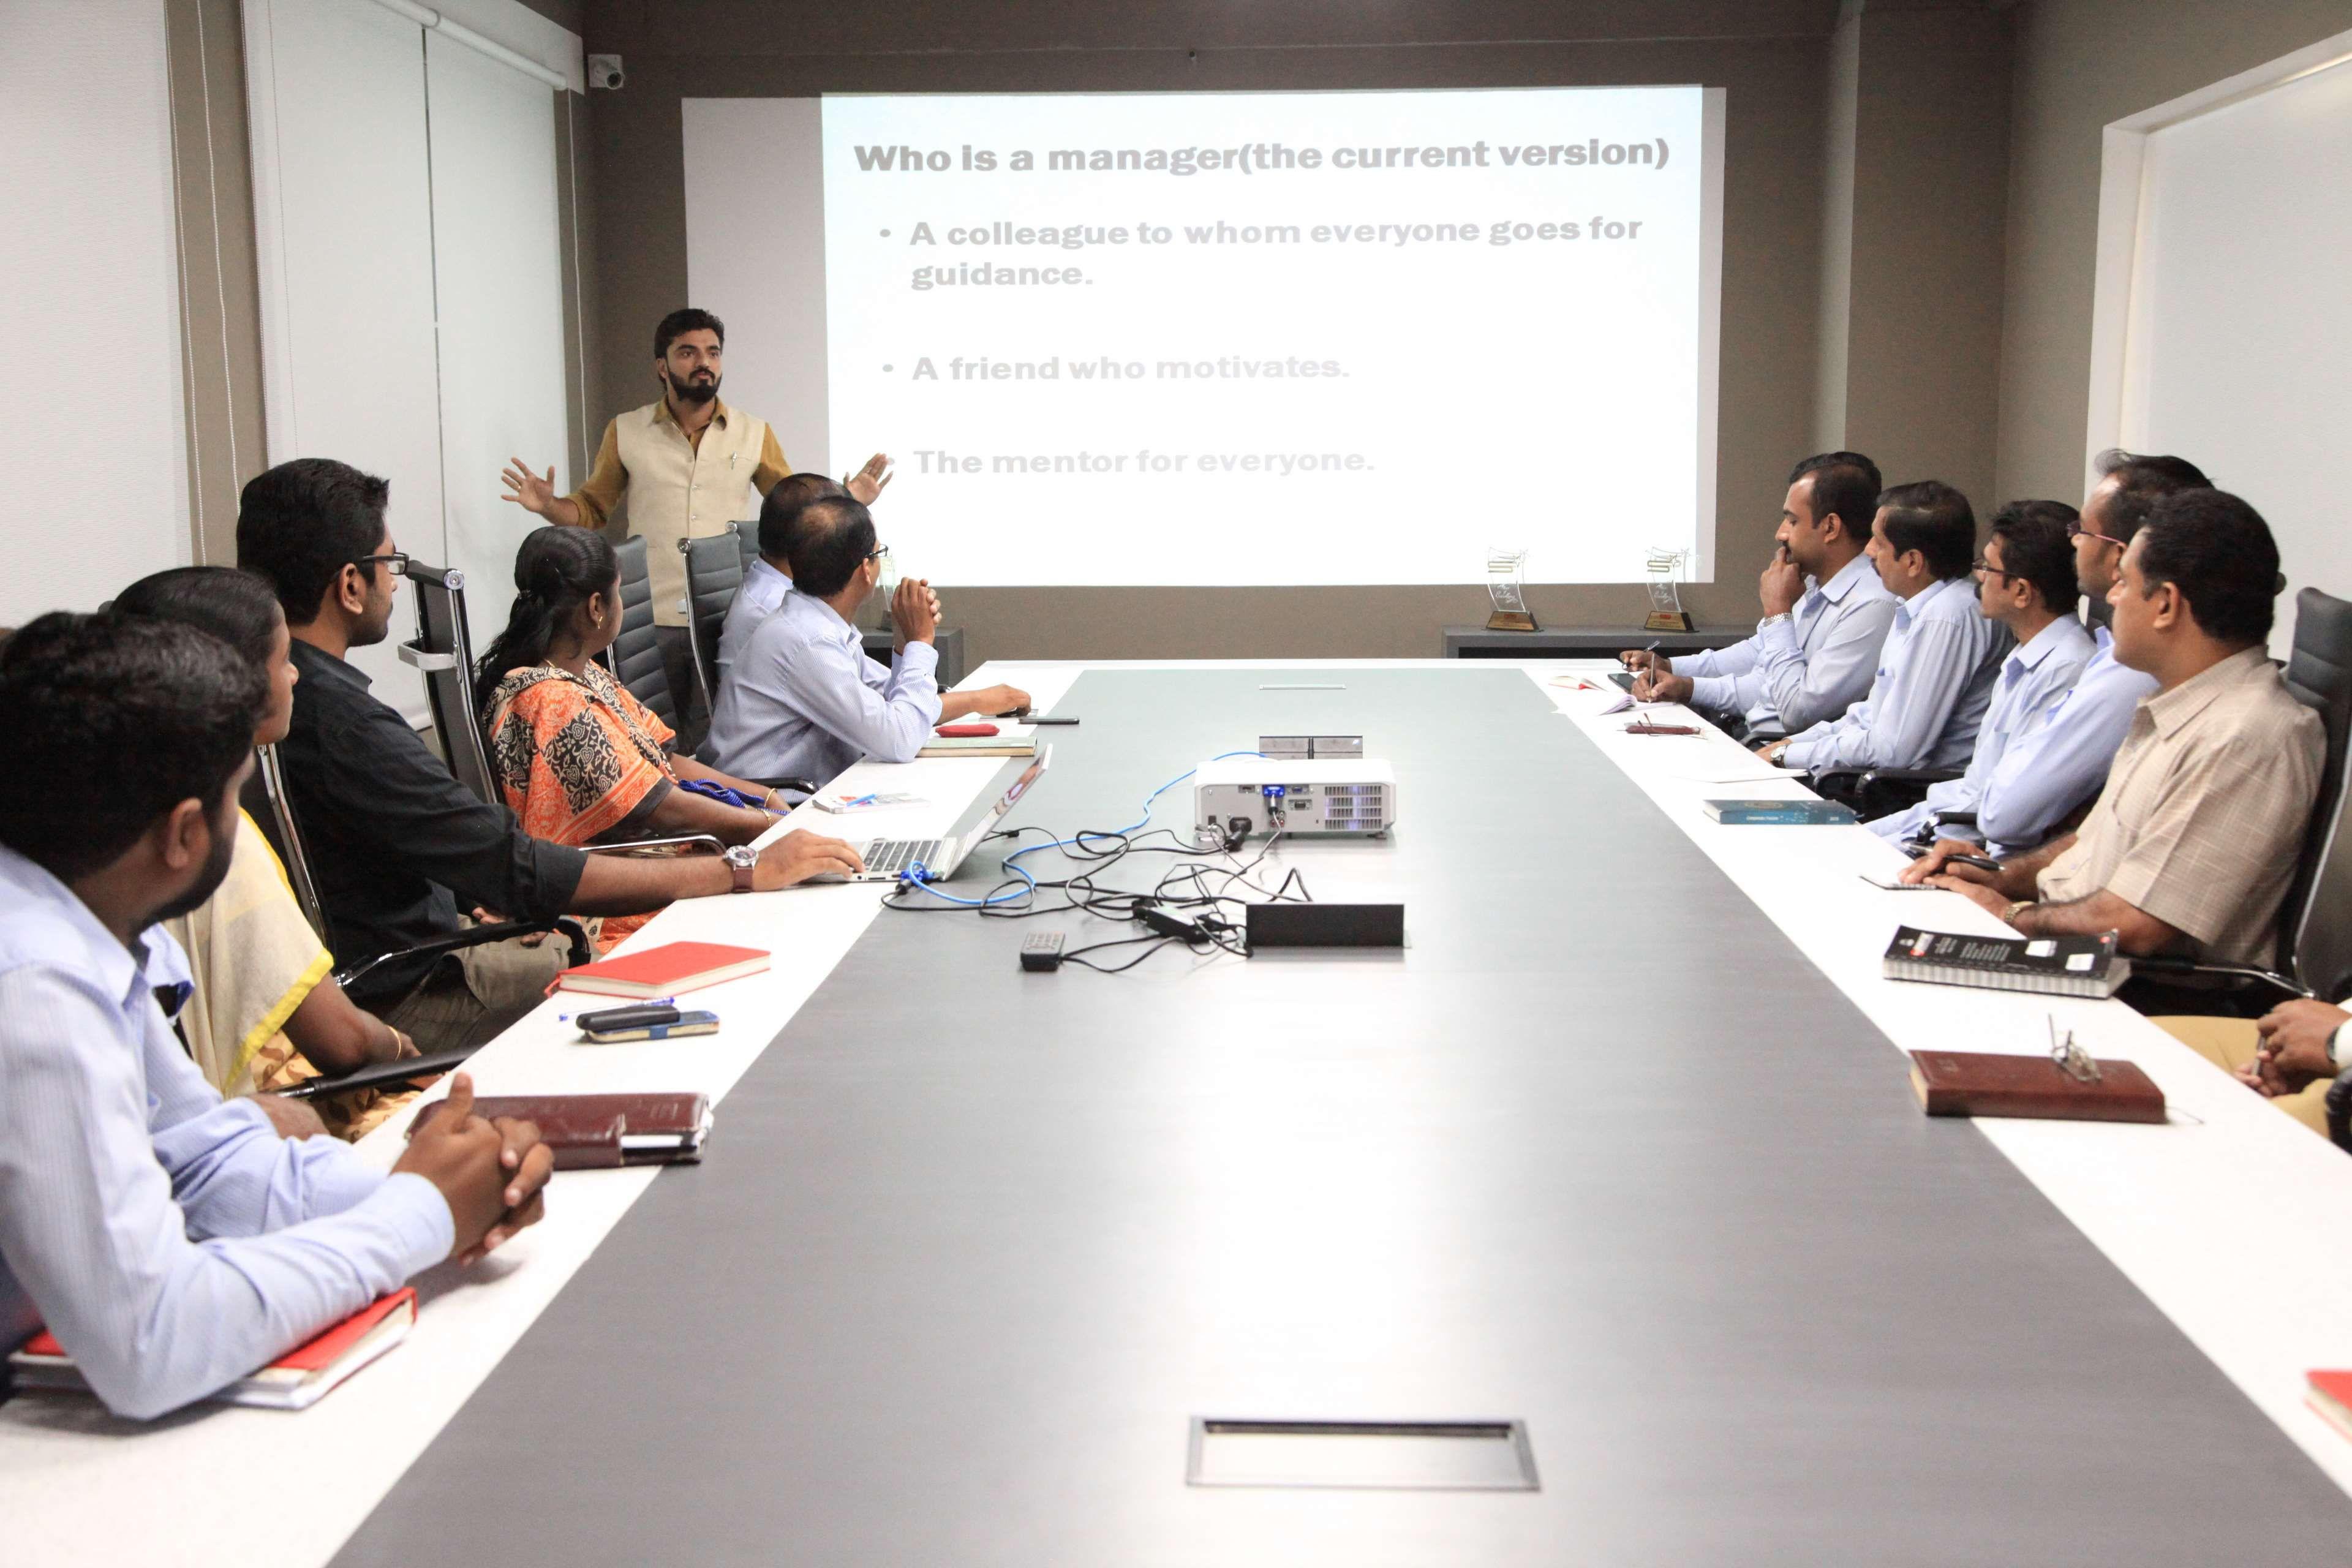 business training class learning teaching Business training 3840x2560